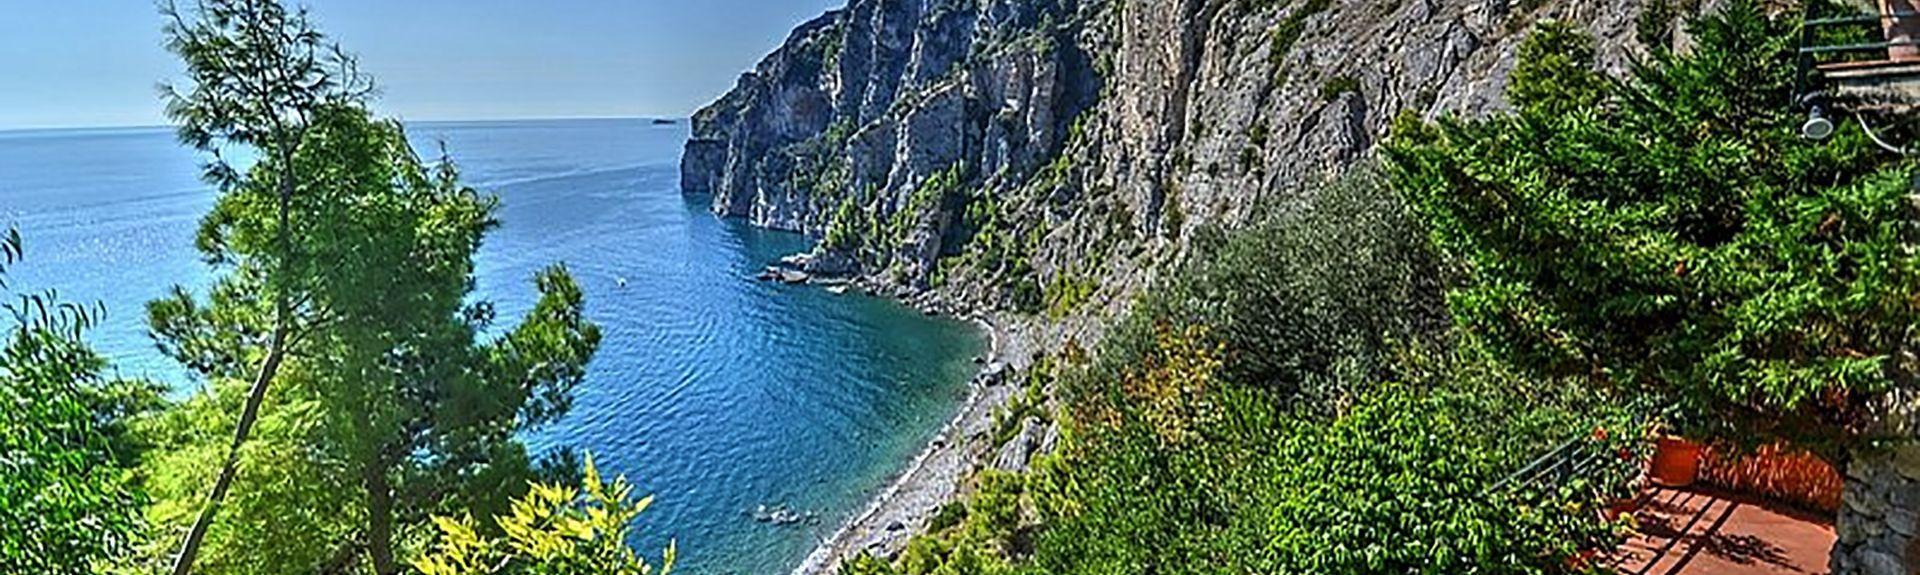 Atrani Strand, Atrani, Campania, Italien